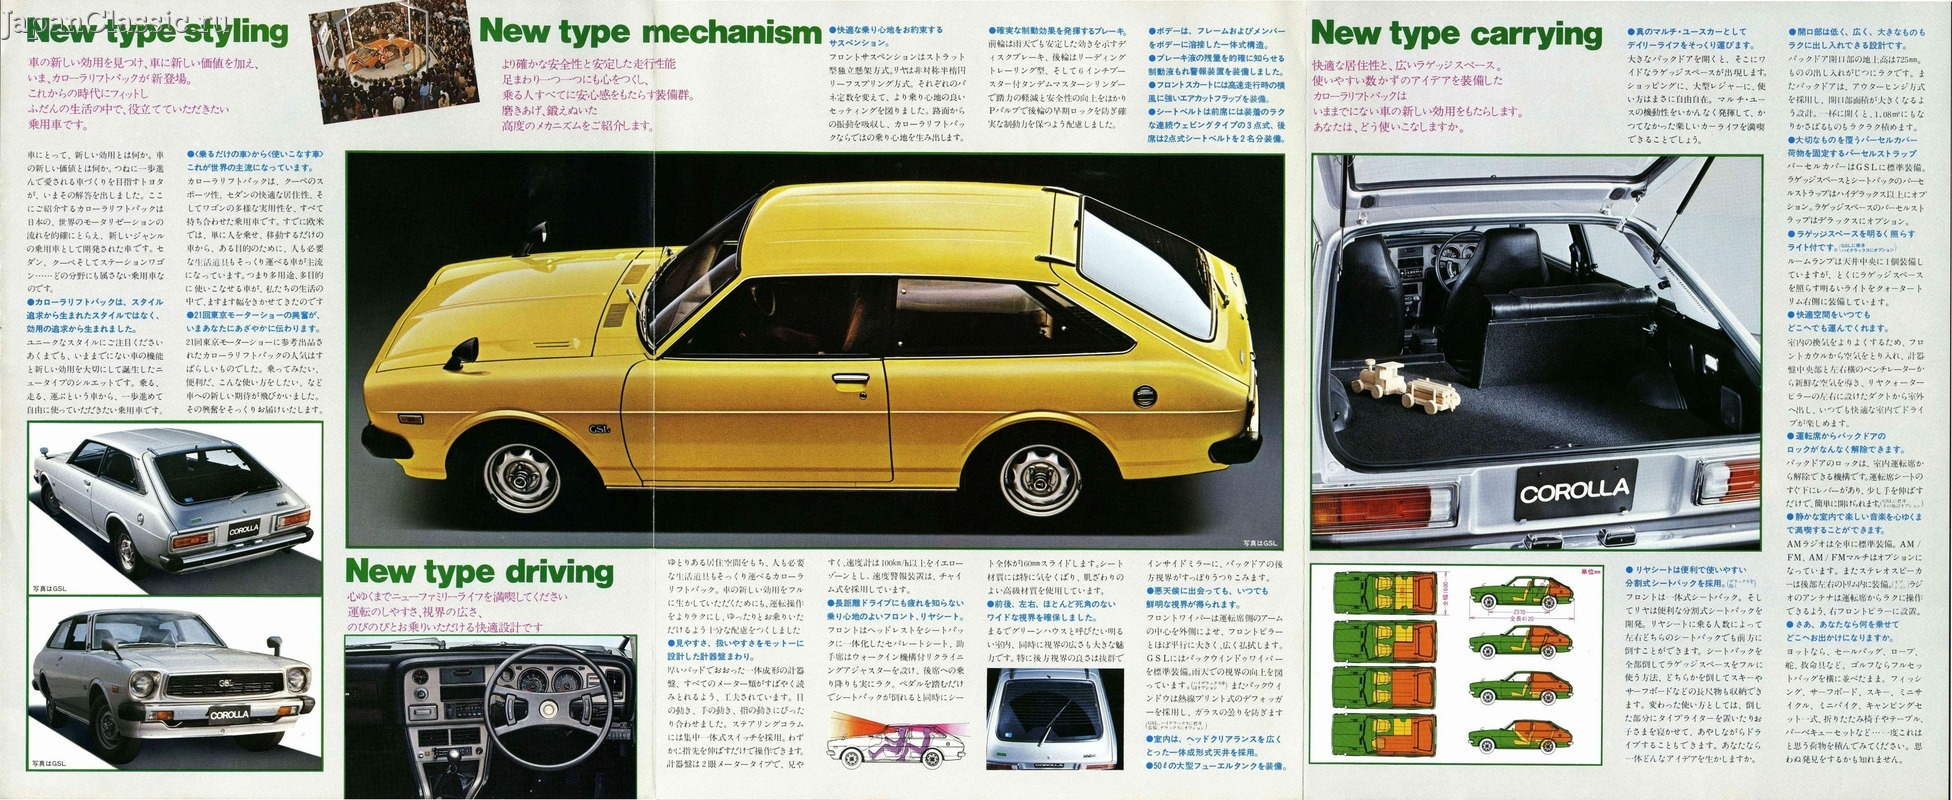 Toyota Corolla 1976 LIFTBACK E30 - JapanClassic